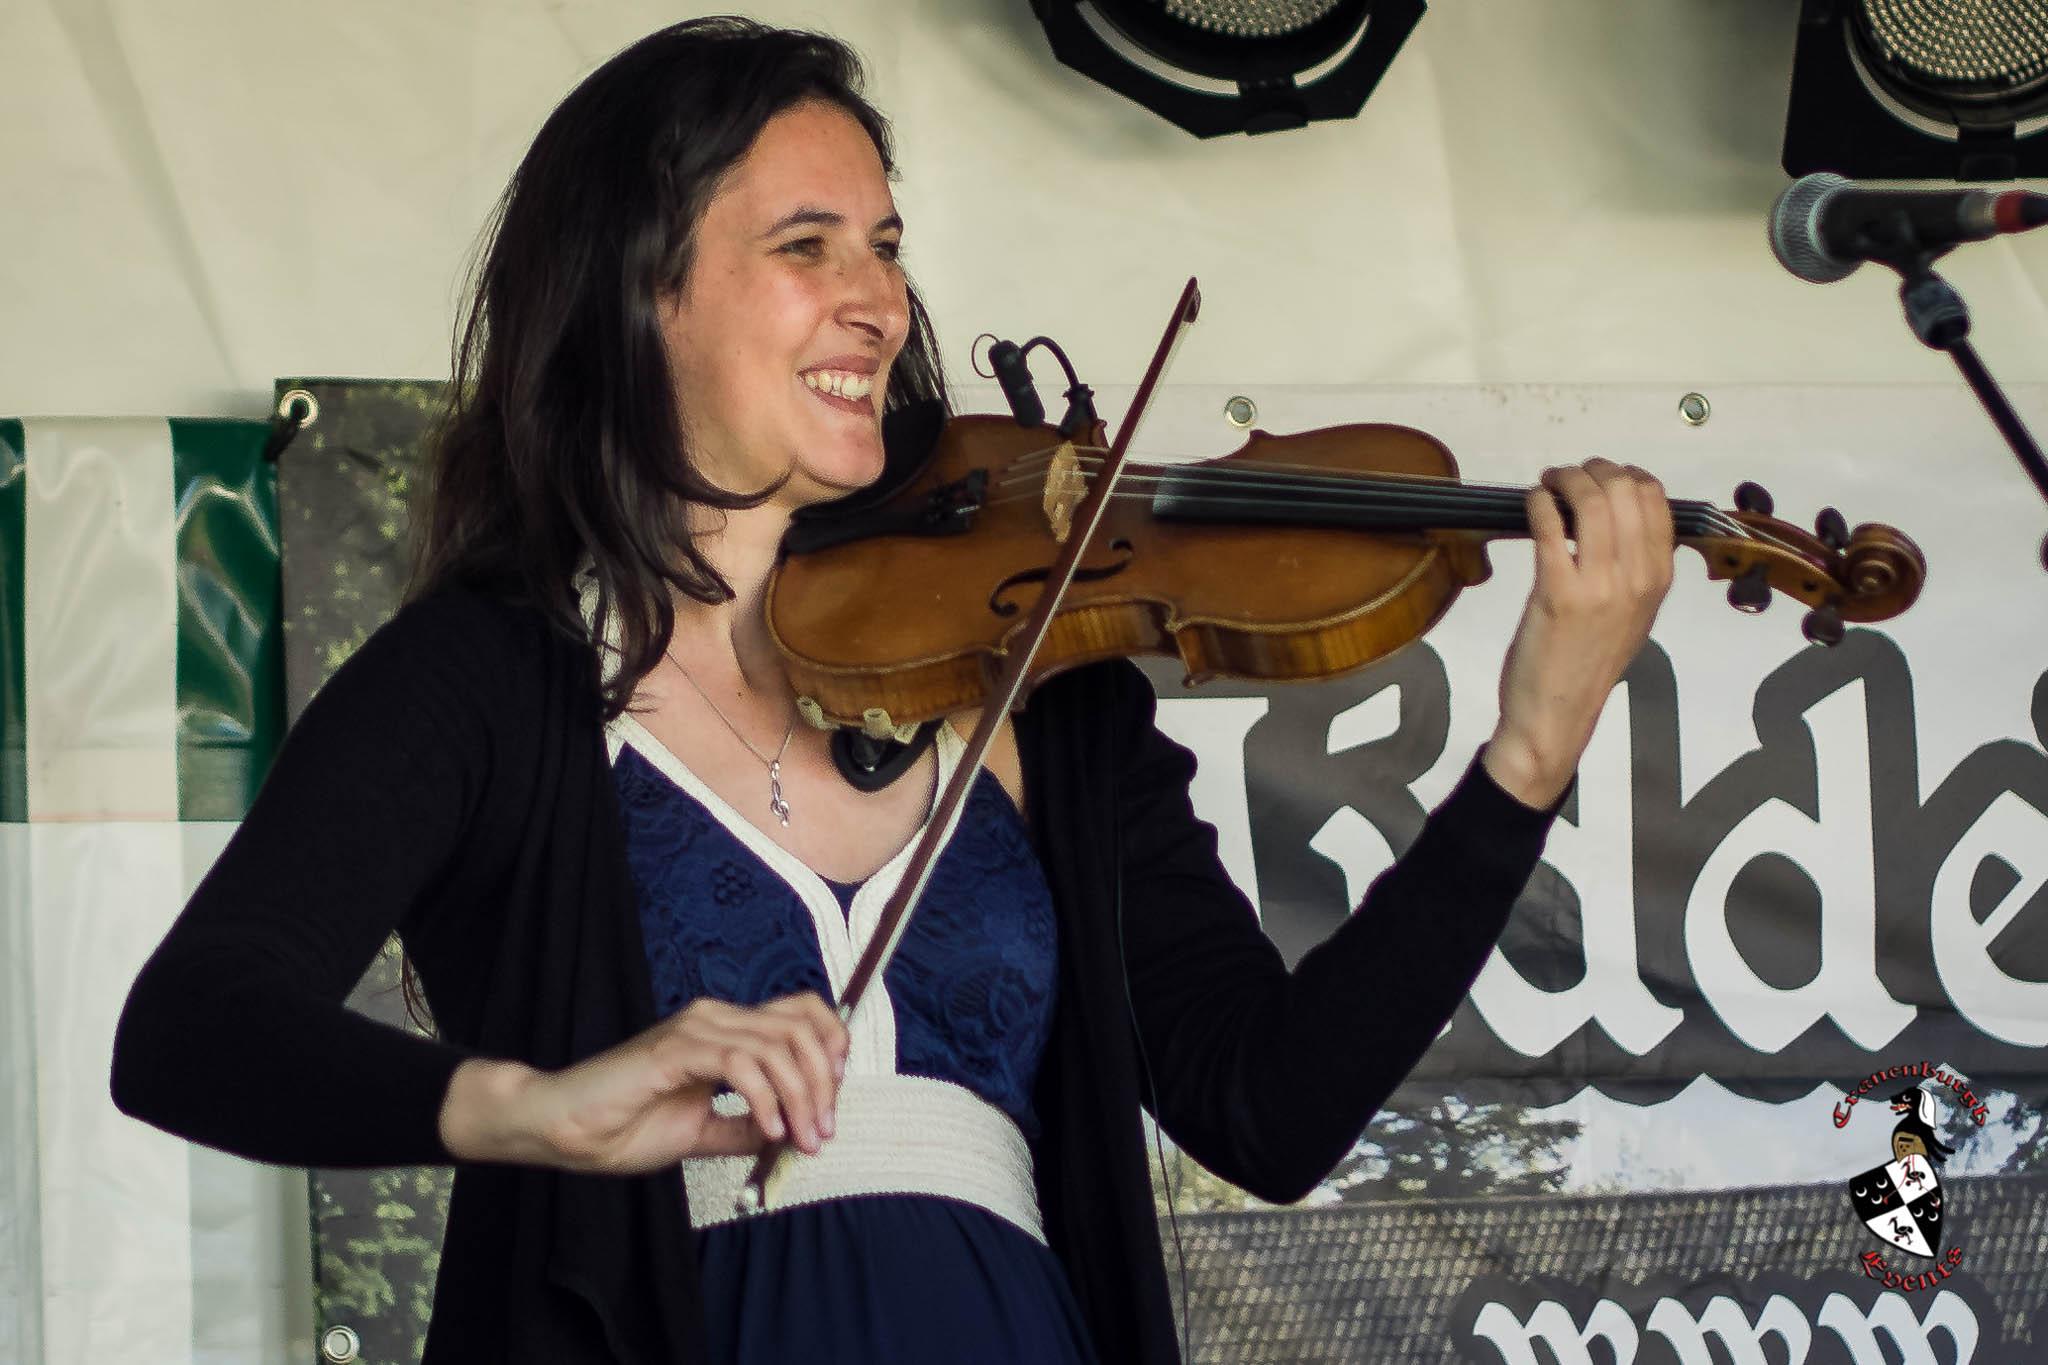 Middeleeuws-Festijn-Cannenburgh-2018-Rodeo-Roses-Ellen-la-Faille-2